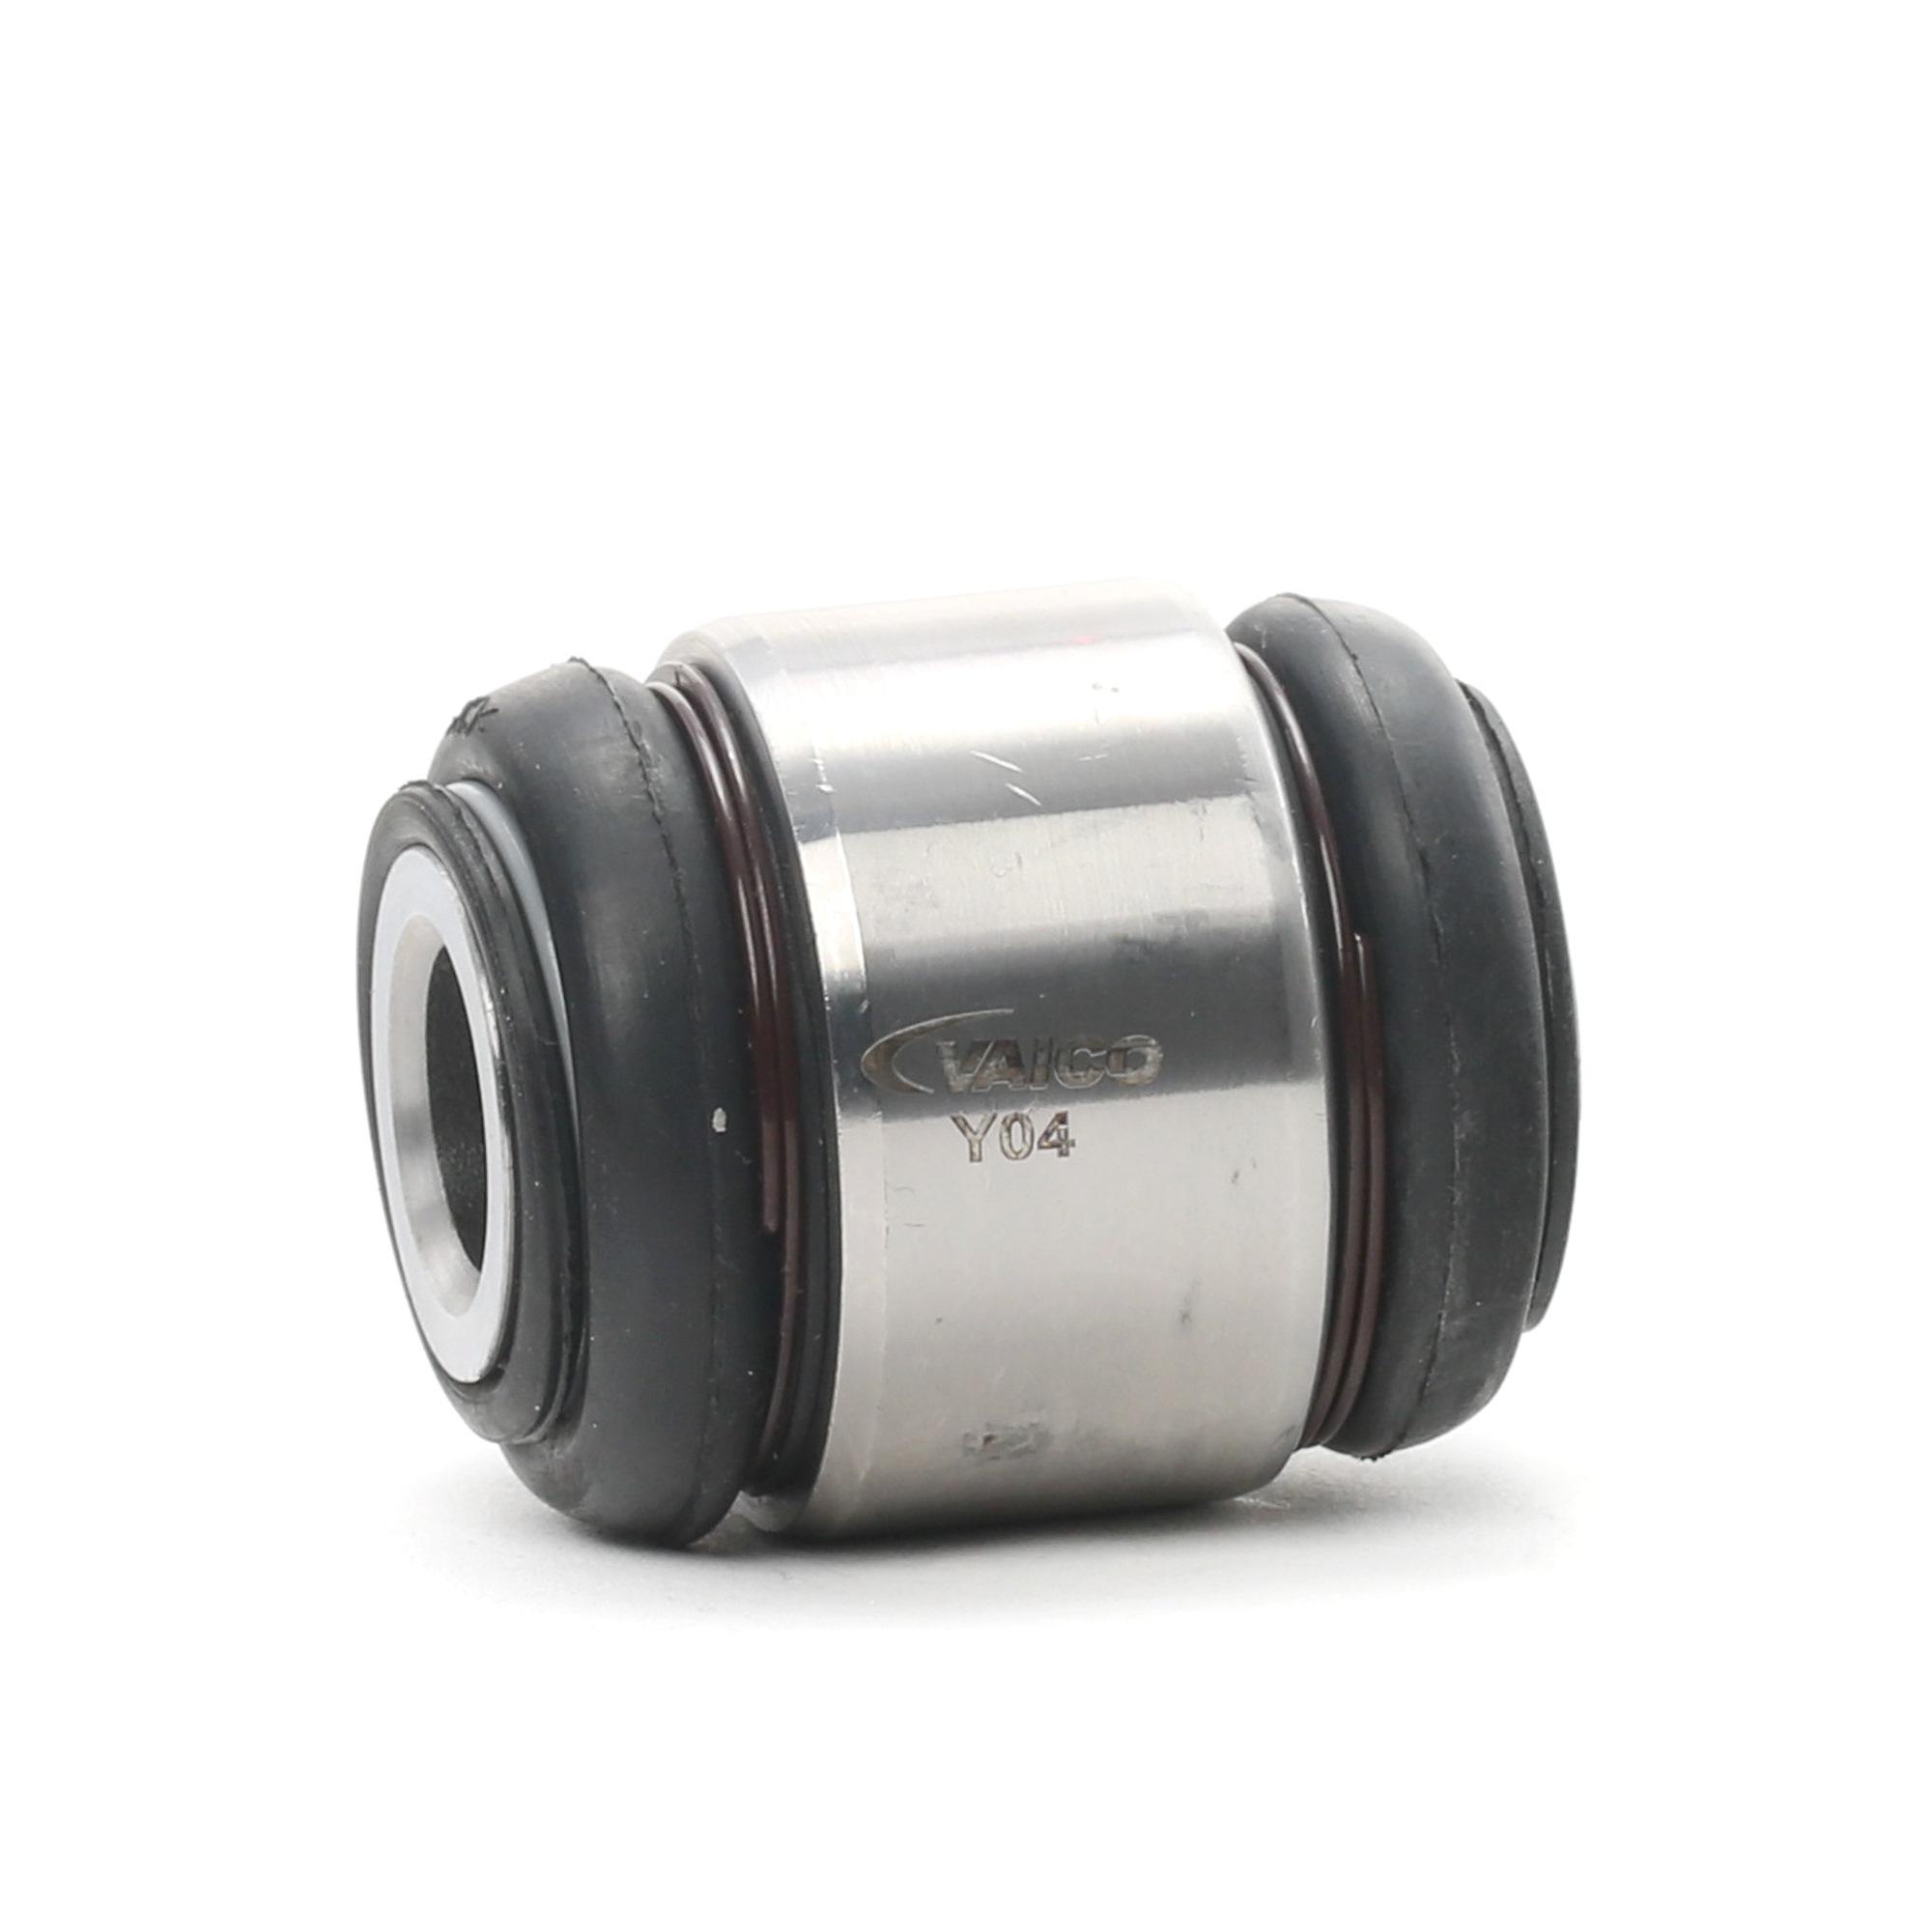 V30-7154 VAICO Original VAICO Qualität, Hydrolager, Hinterachse, unten, Querlenker Ø: 40mm Lagerung, Lenker V30-7154 günstig kaufen